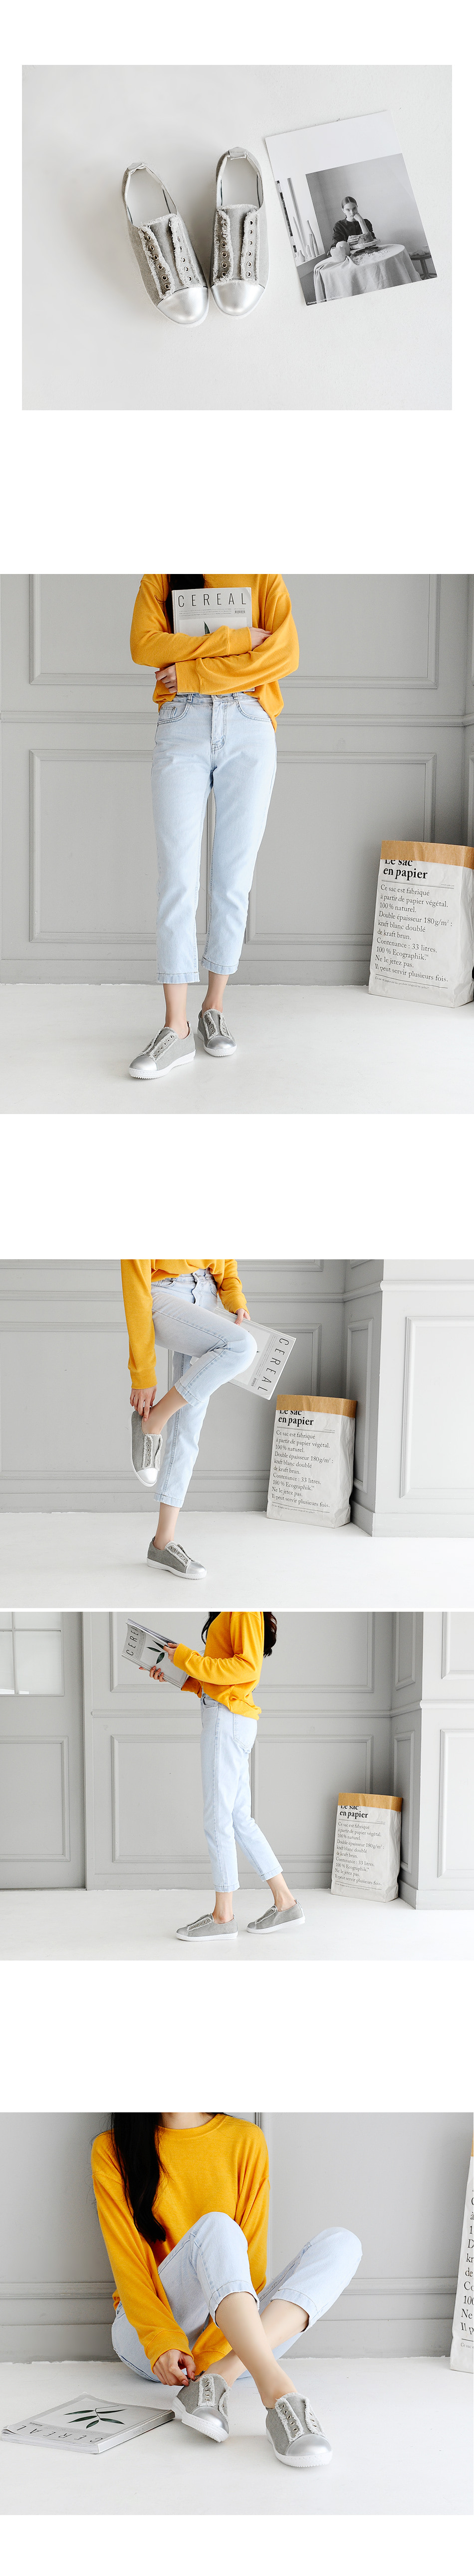 Debenz Height Slip-on 3cm